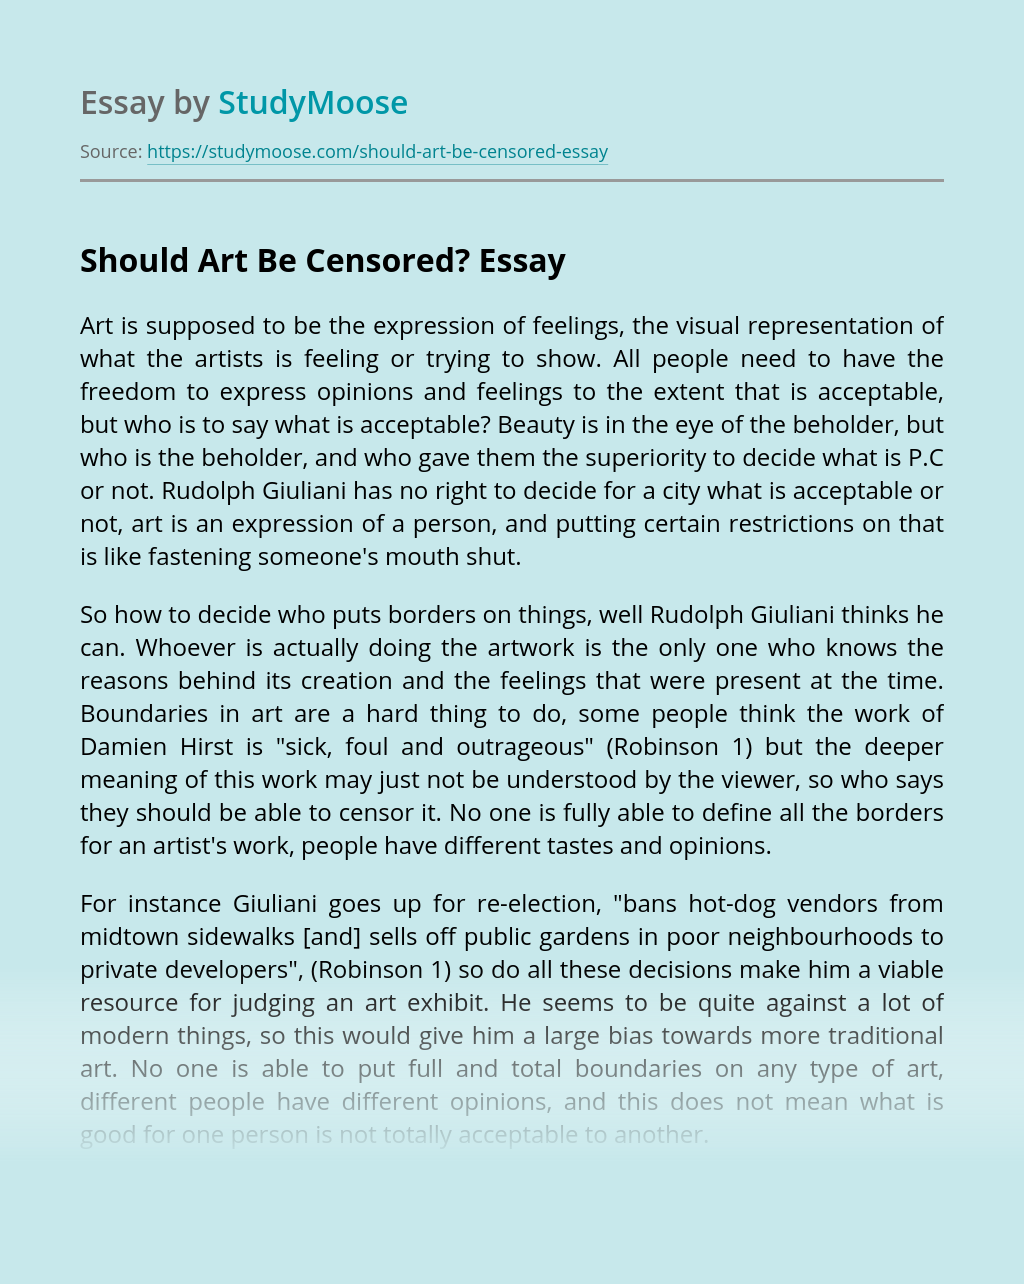 Should Art Be Censored?